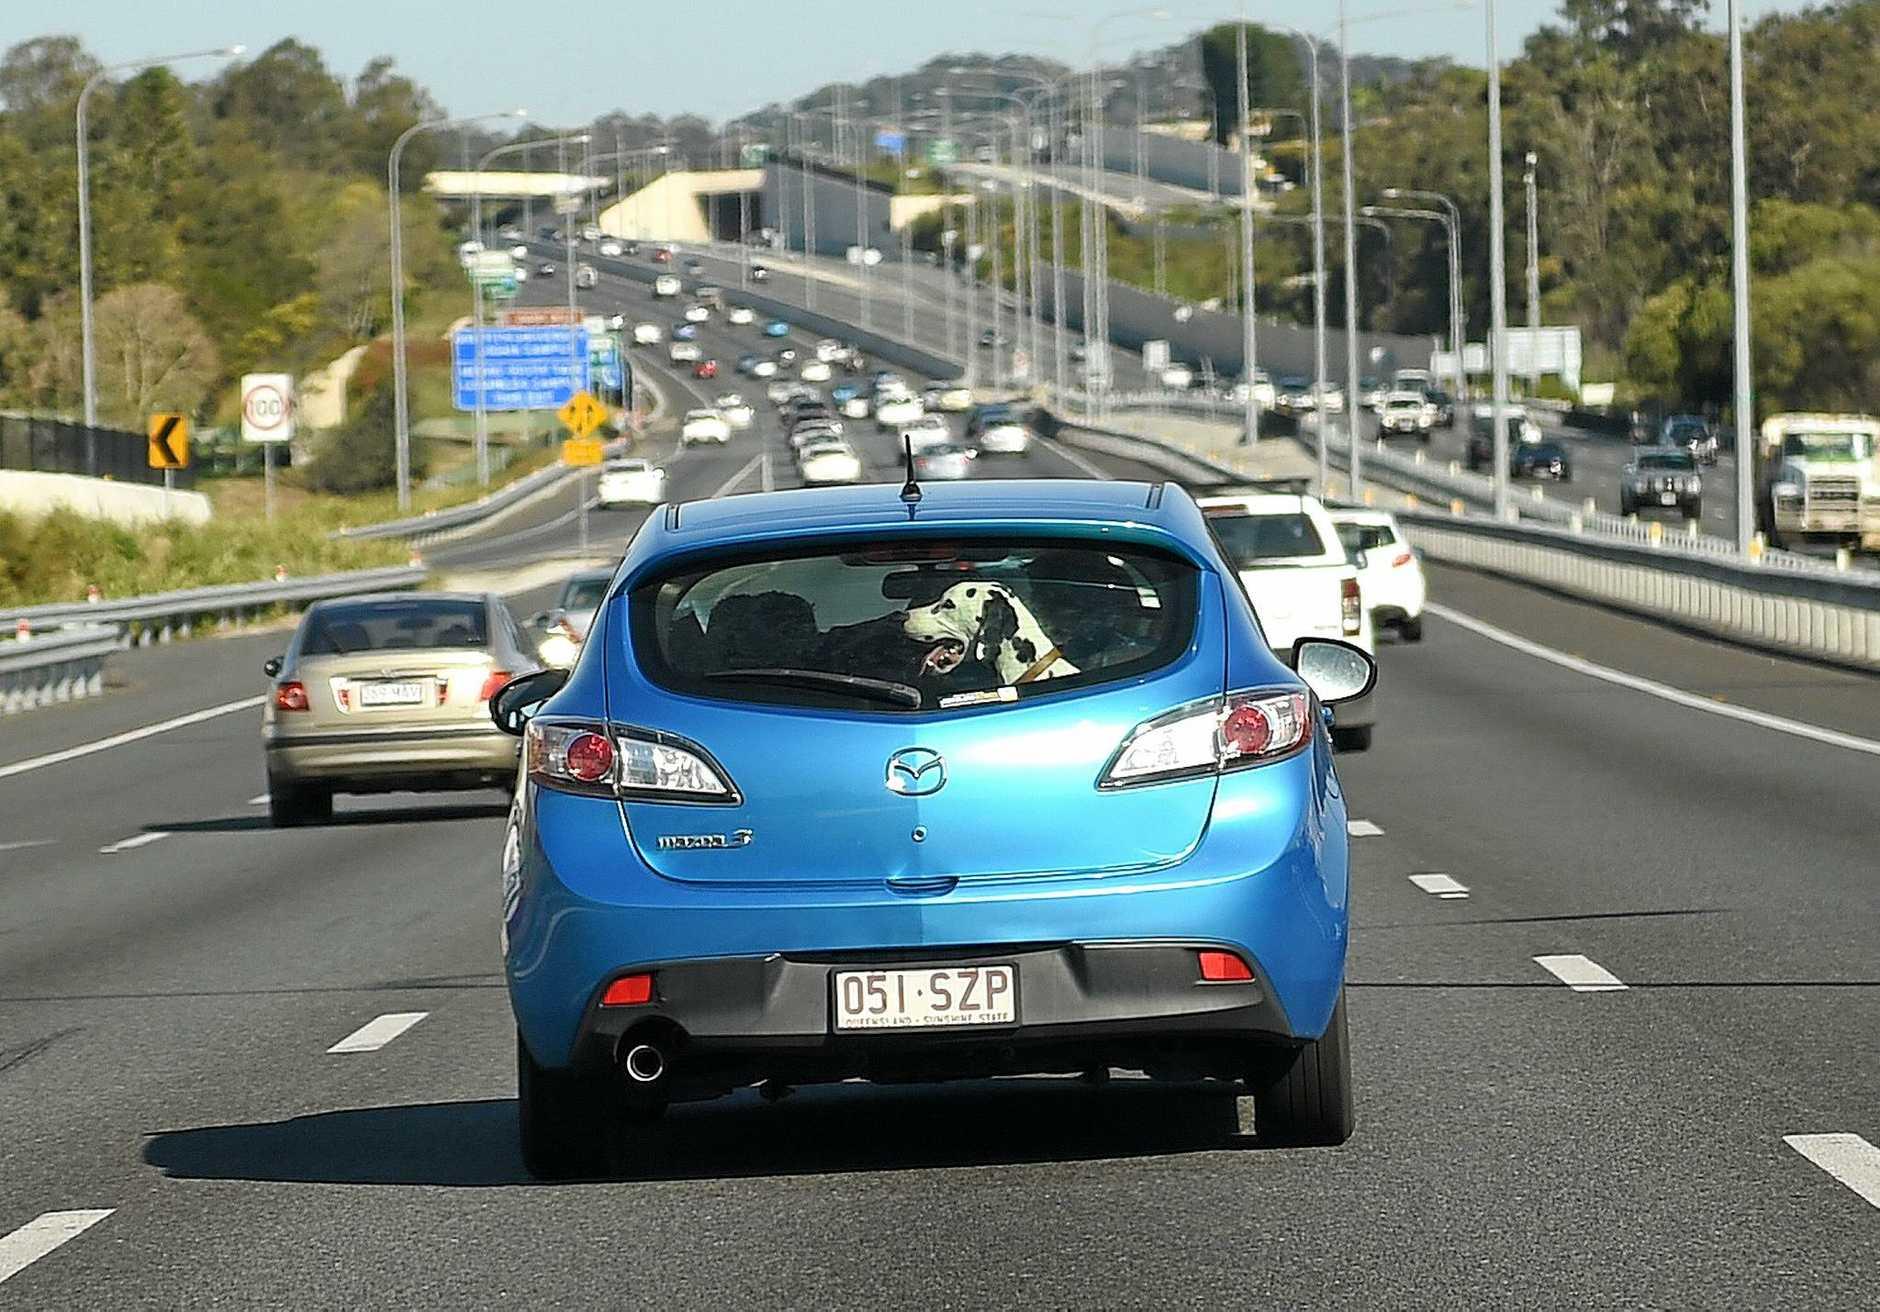 The Pacific Motorway near Brisbane.